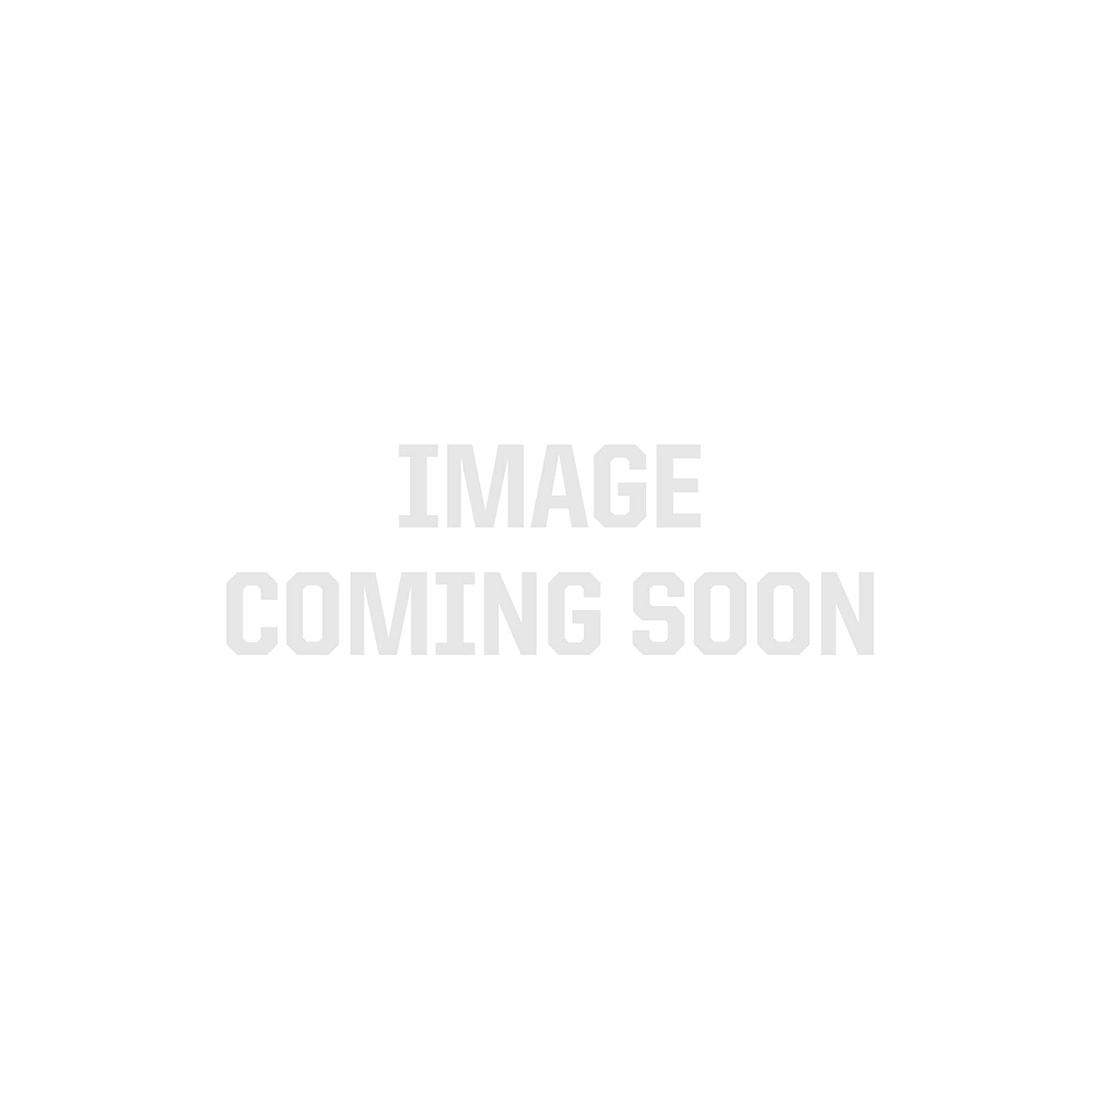 PowerPro 6 Channel DMX Decoder - 24V - 240W